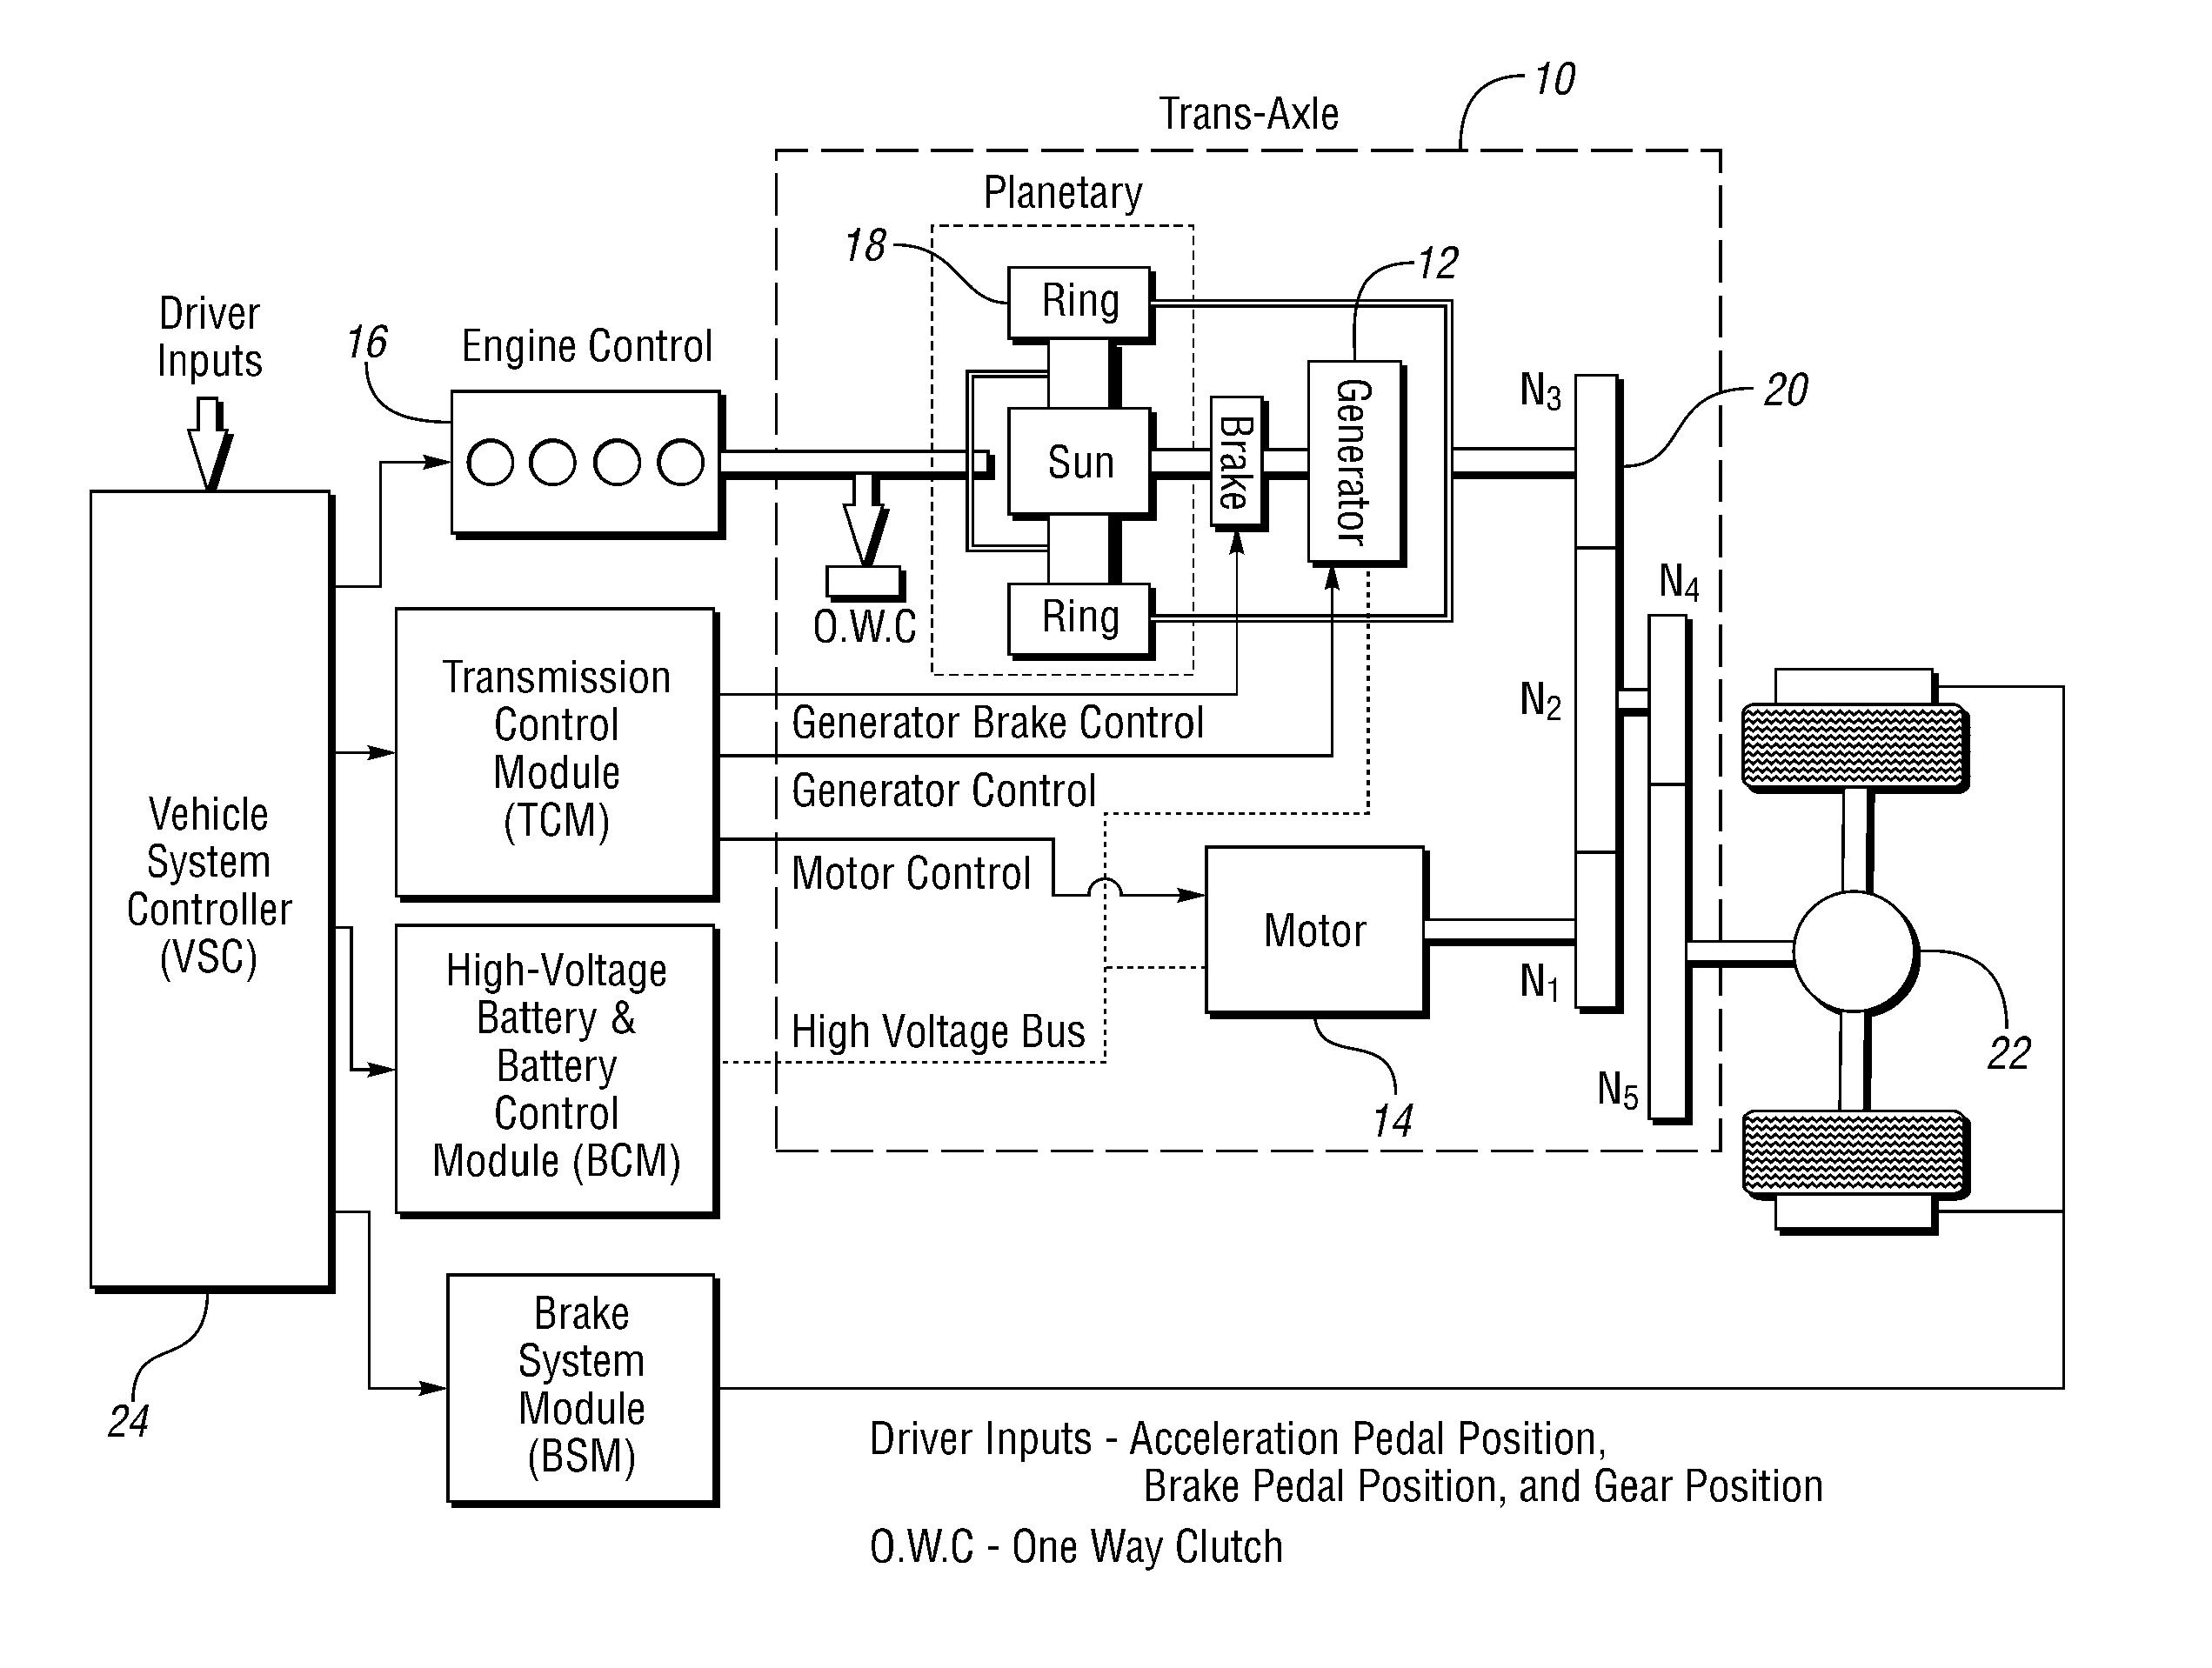 wd45 wiring diagram schematic diagrams allis chalmers d14 wiring diagram  allis chalmers wd45 wiring diagram 34